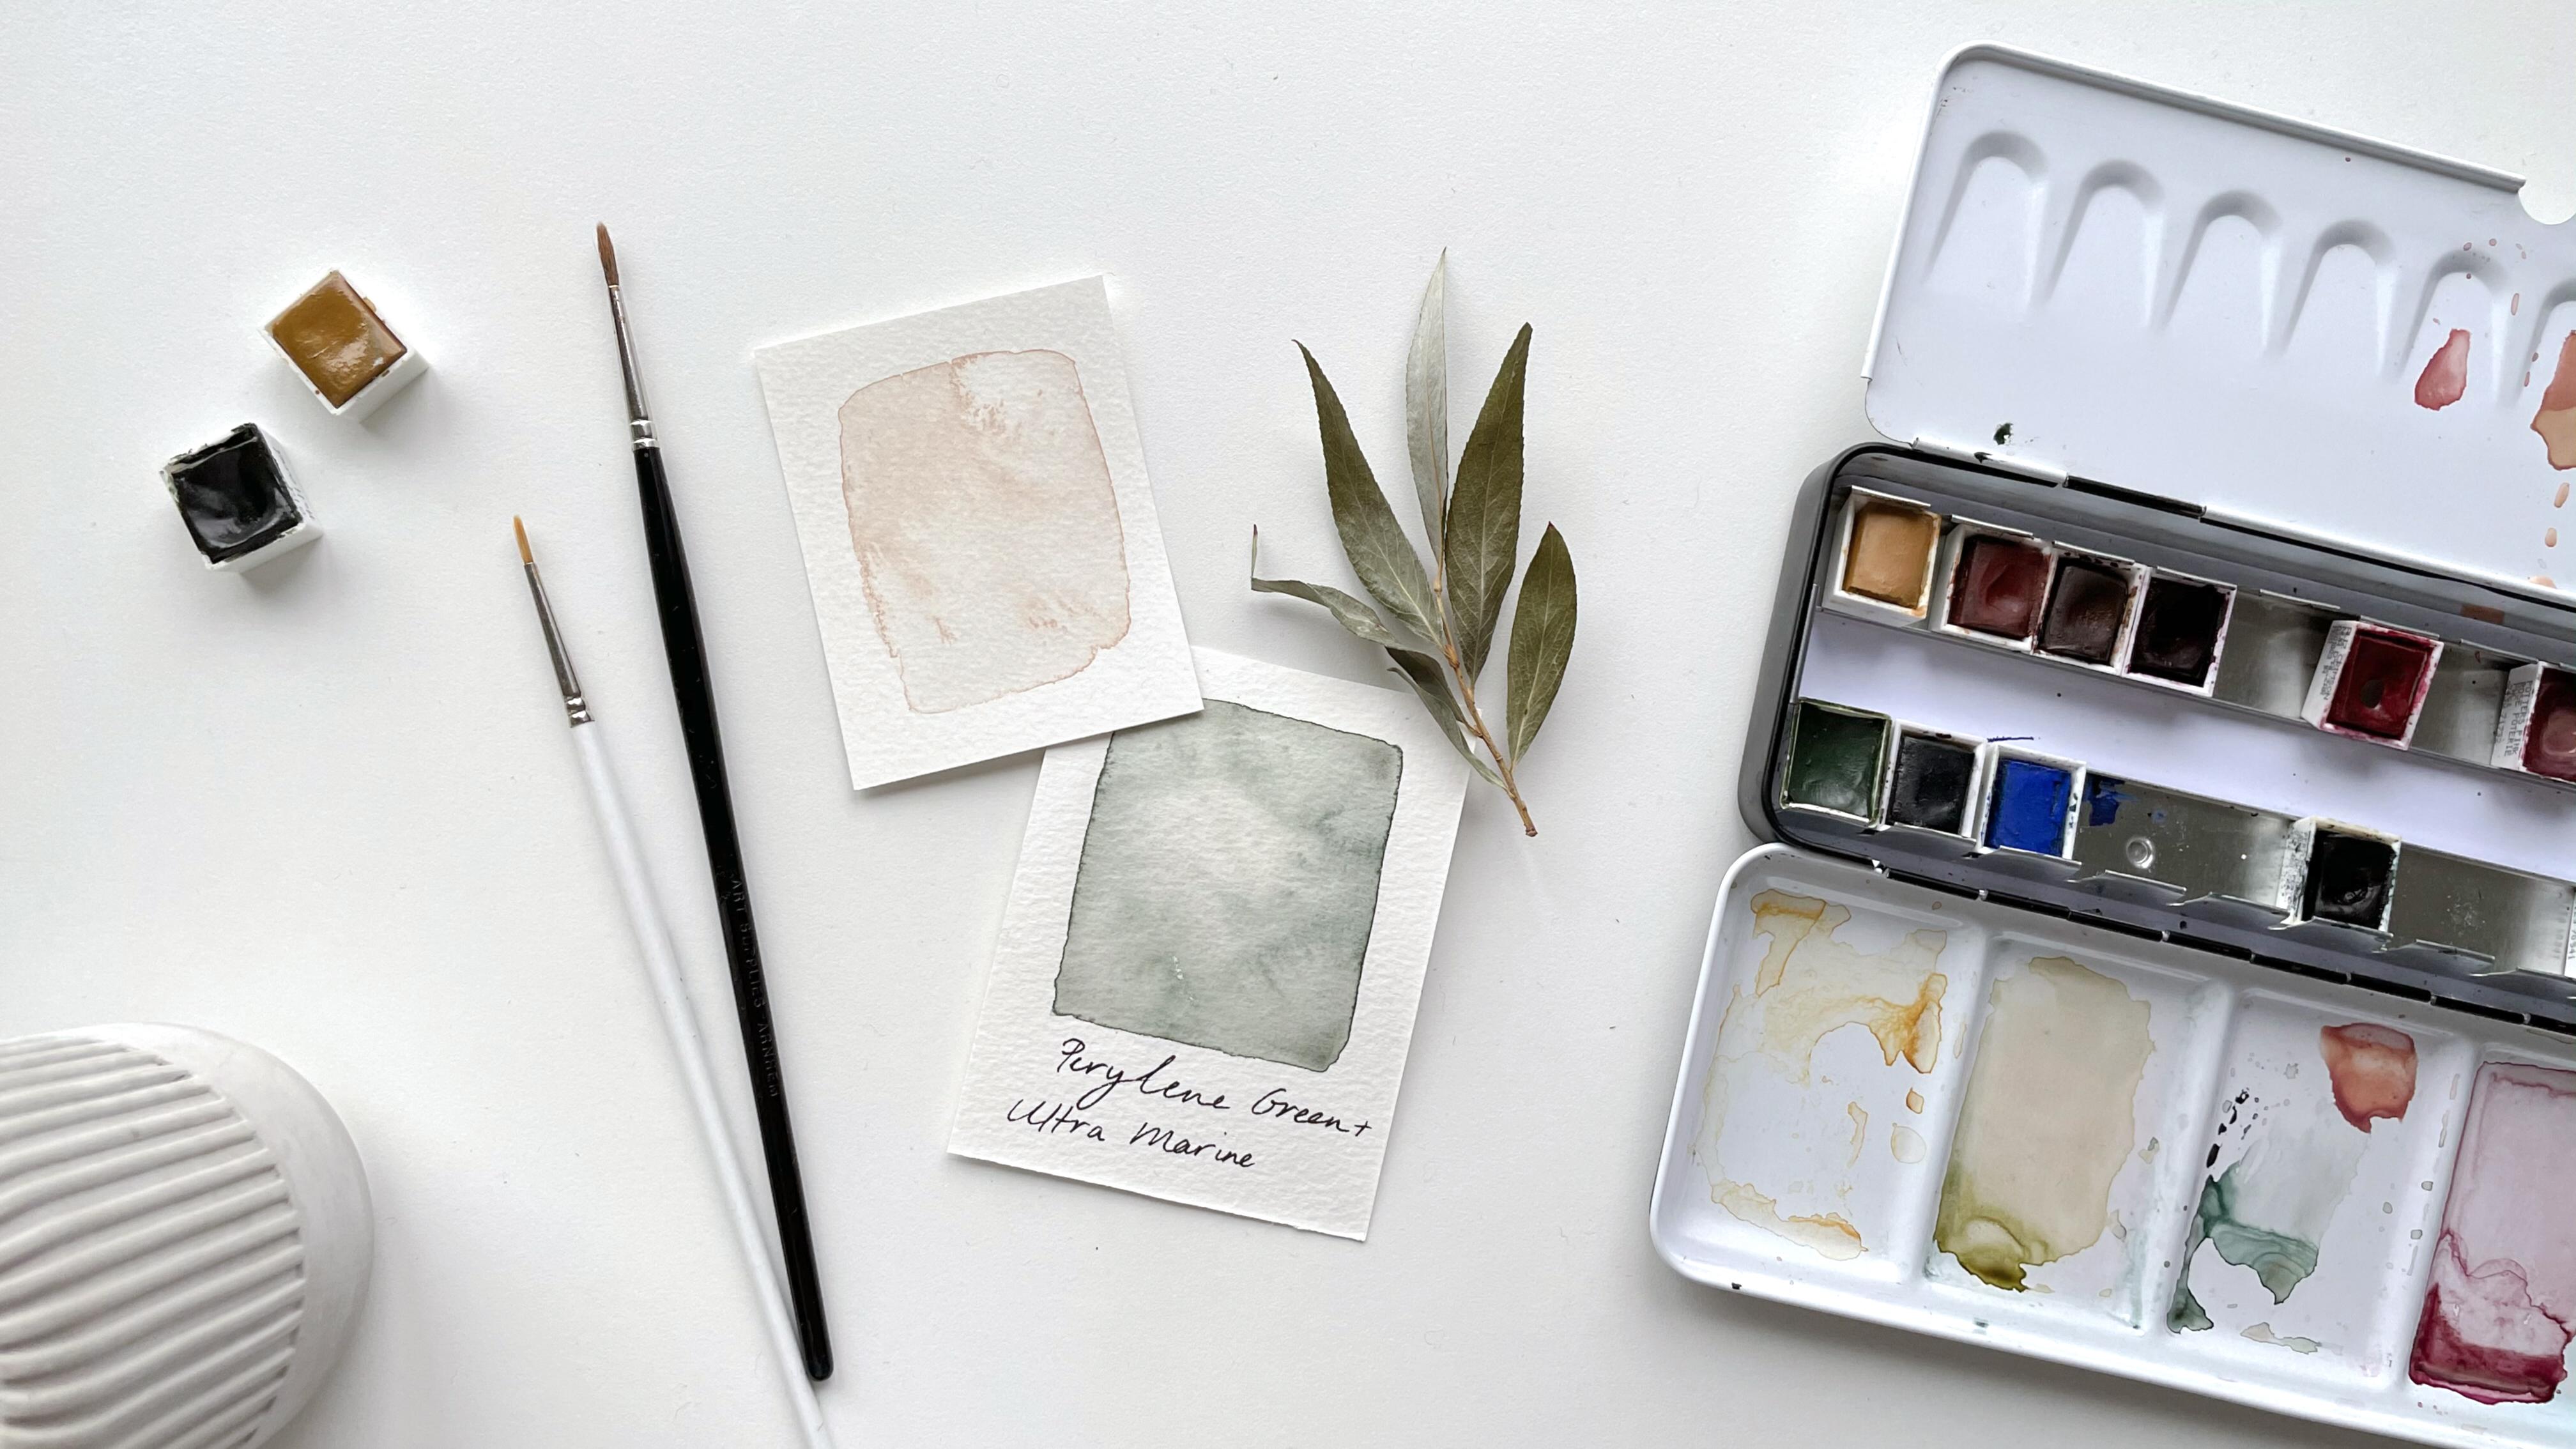 bloom creatives art classes